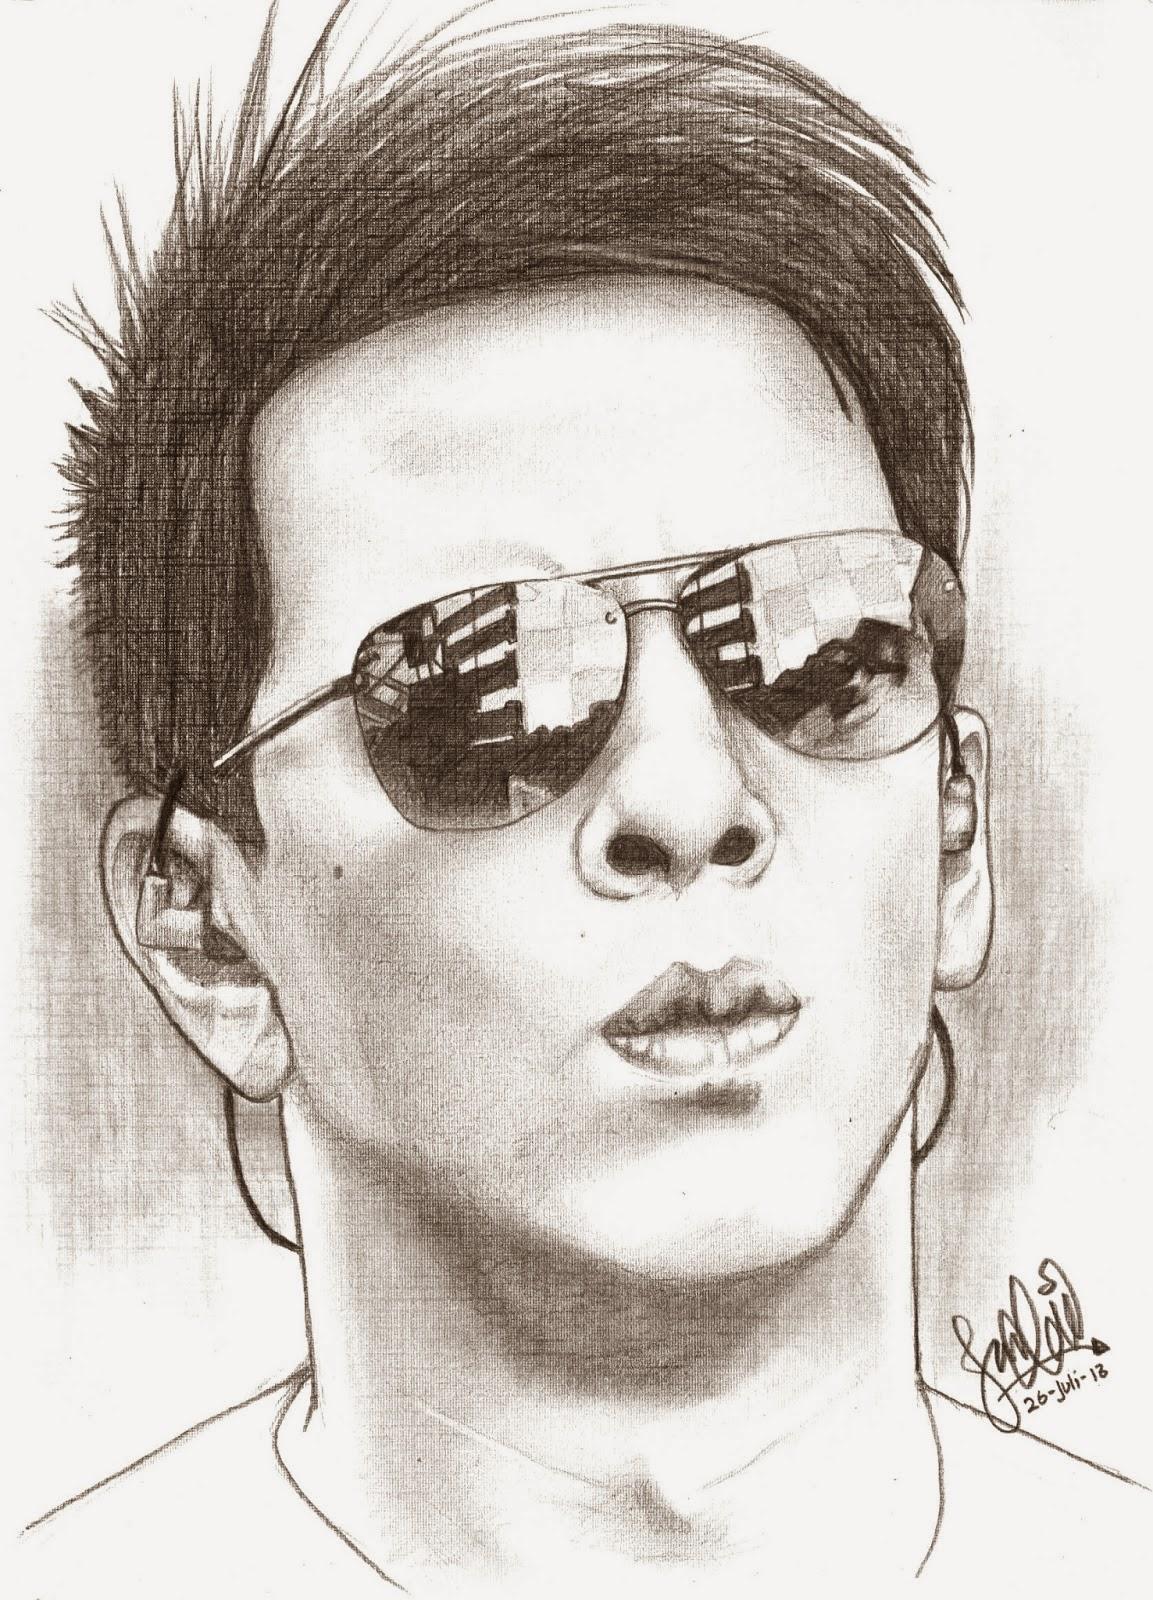 Download Kumpulan Sketsa Gambar Wajah Orang